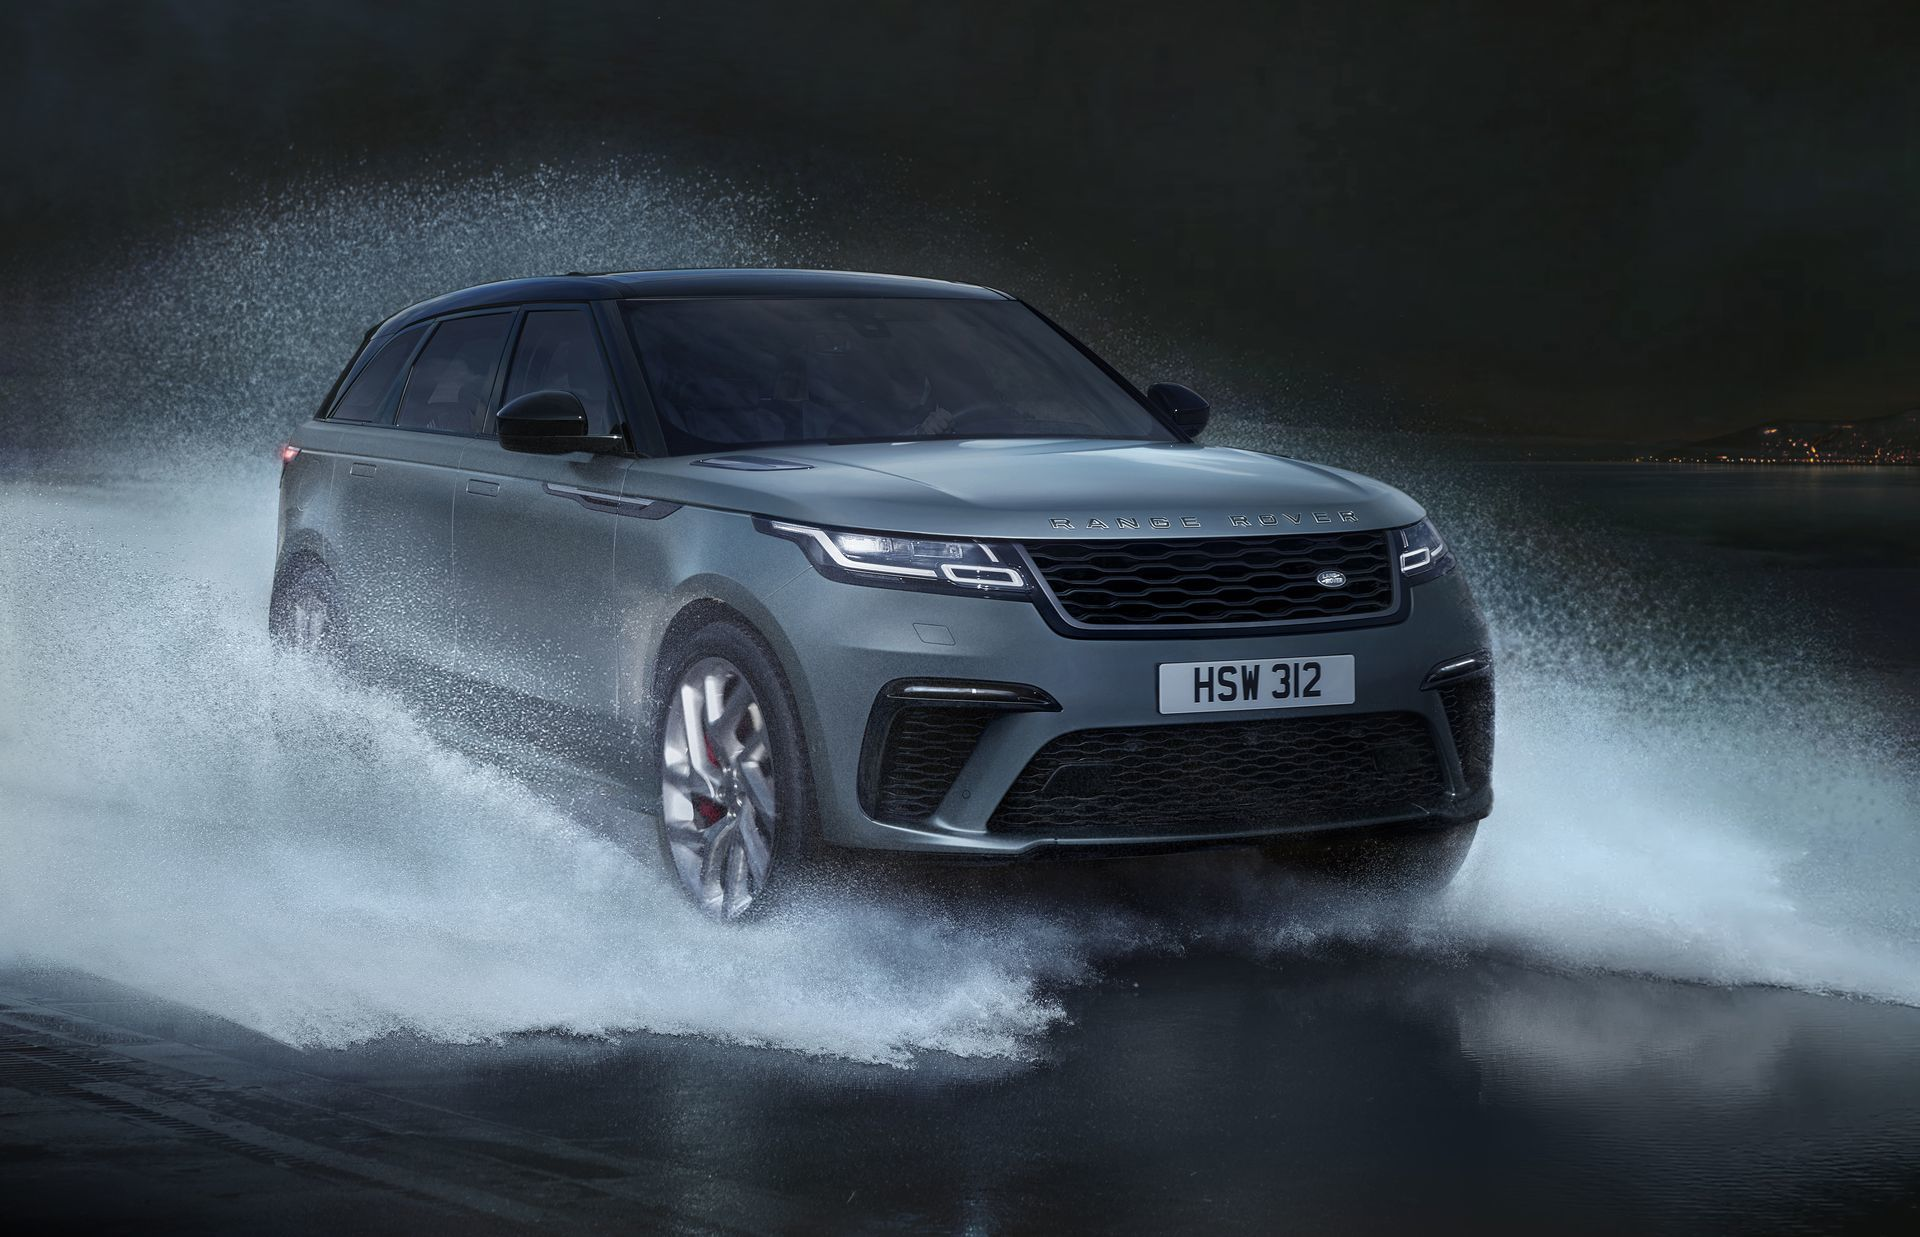 Range Rover Velar Svautobiography 14